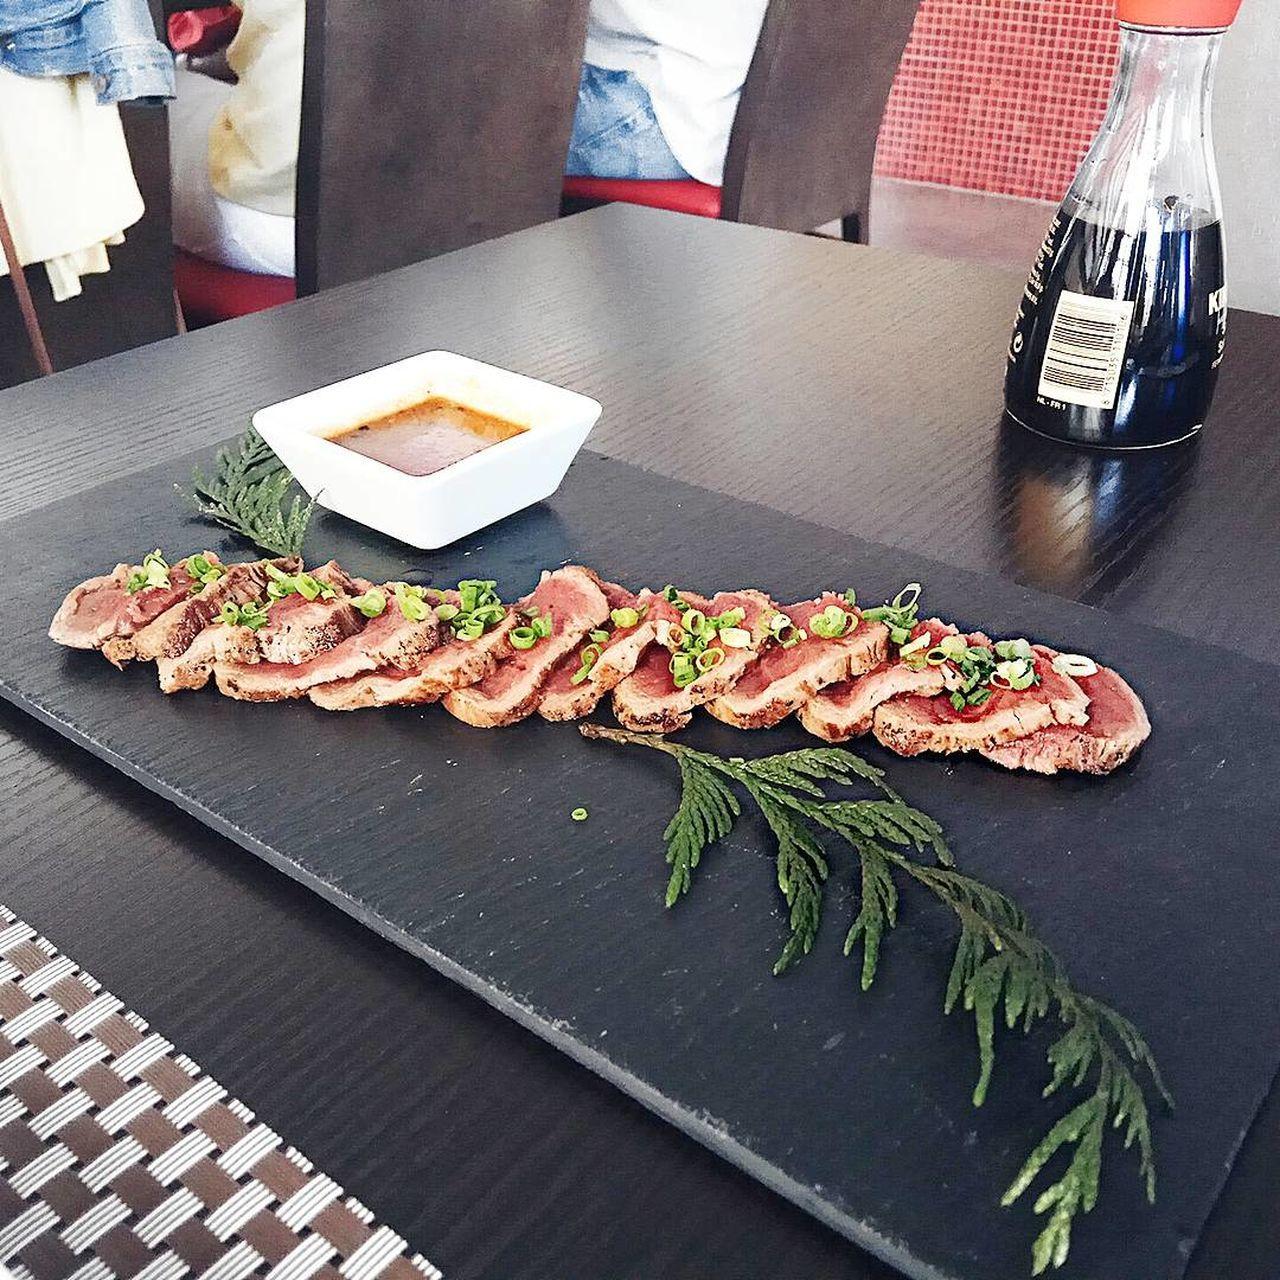 Food And Drink Food Ready-to-eat Close-up Indoors  Freshness Sushi Sushilover Sushitime Rice Sesame Sesame Seed Soya Soya Sauce Tataki Japan Japanese  Japanese Food Delicious Foodlover Foodtasting Yummy